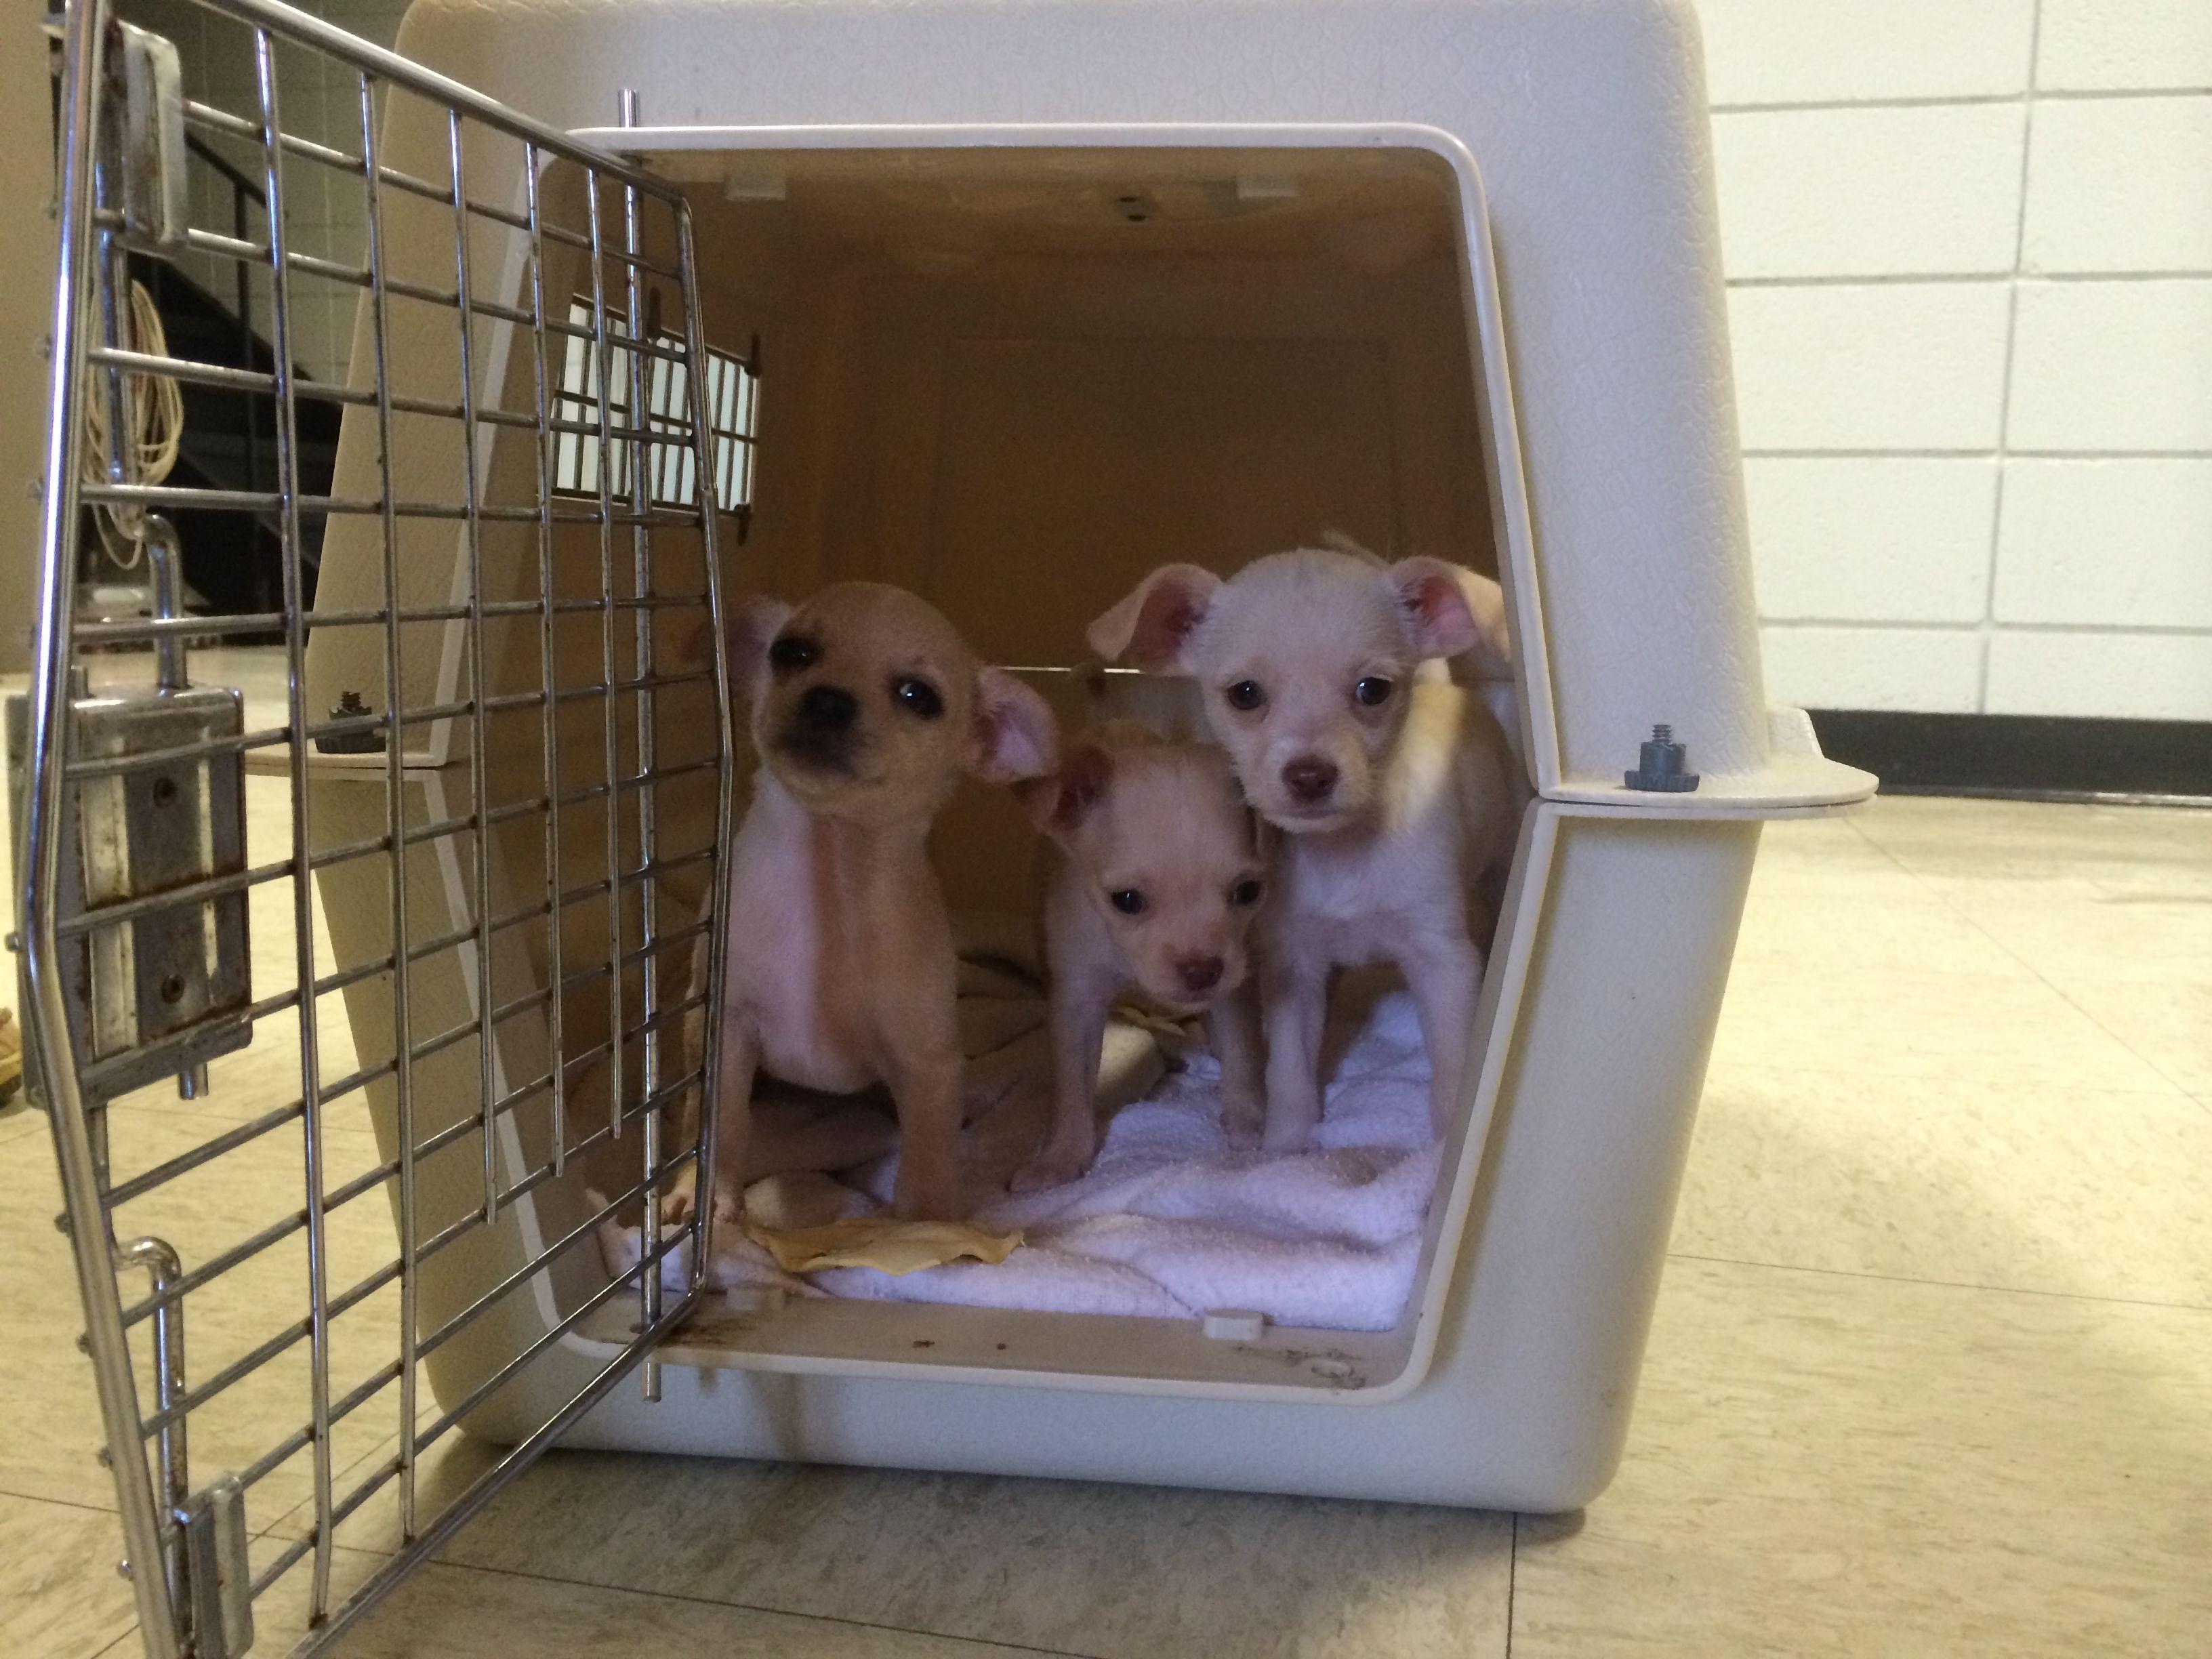 Puppies Sound Good Meet Three Tiny Puppies Tiny Puppies Puppies Sounds Good